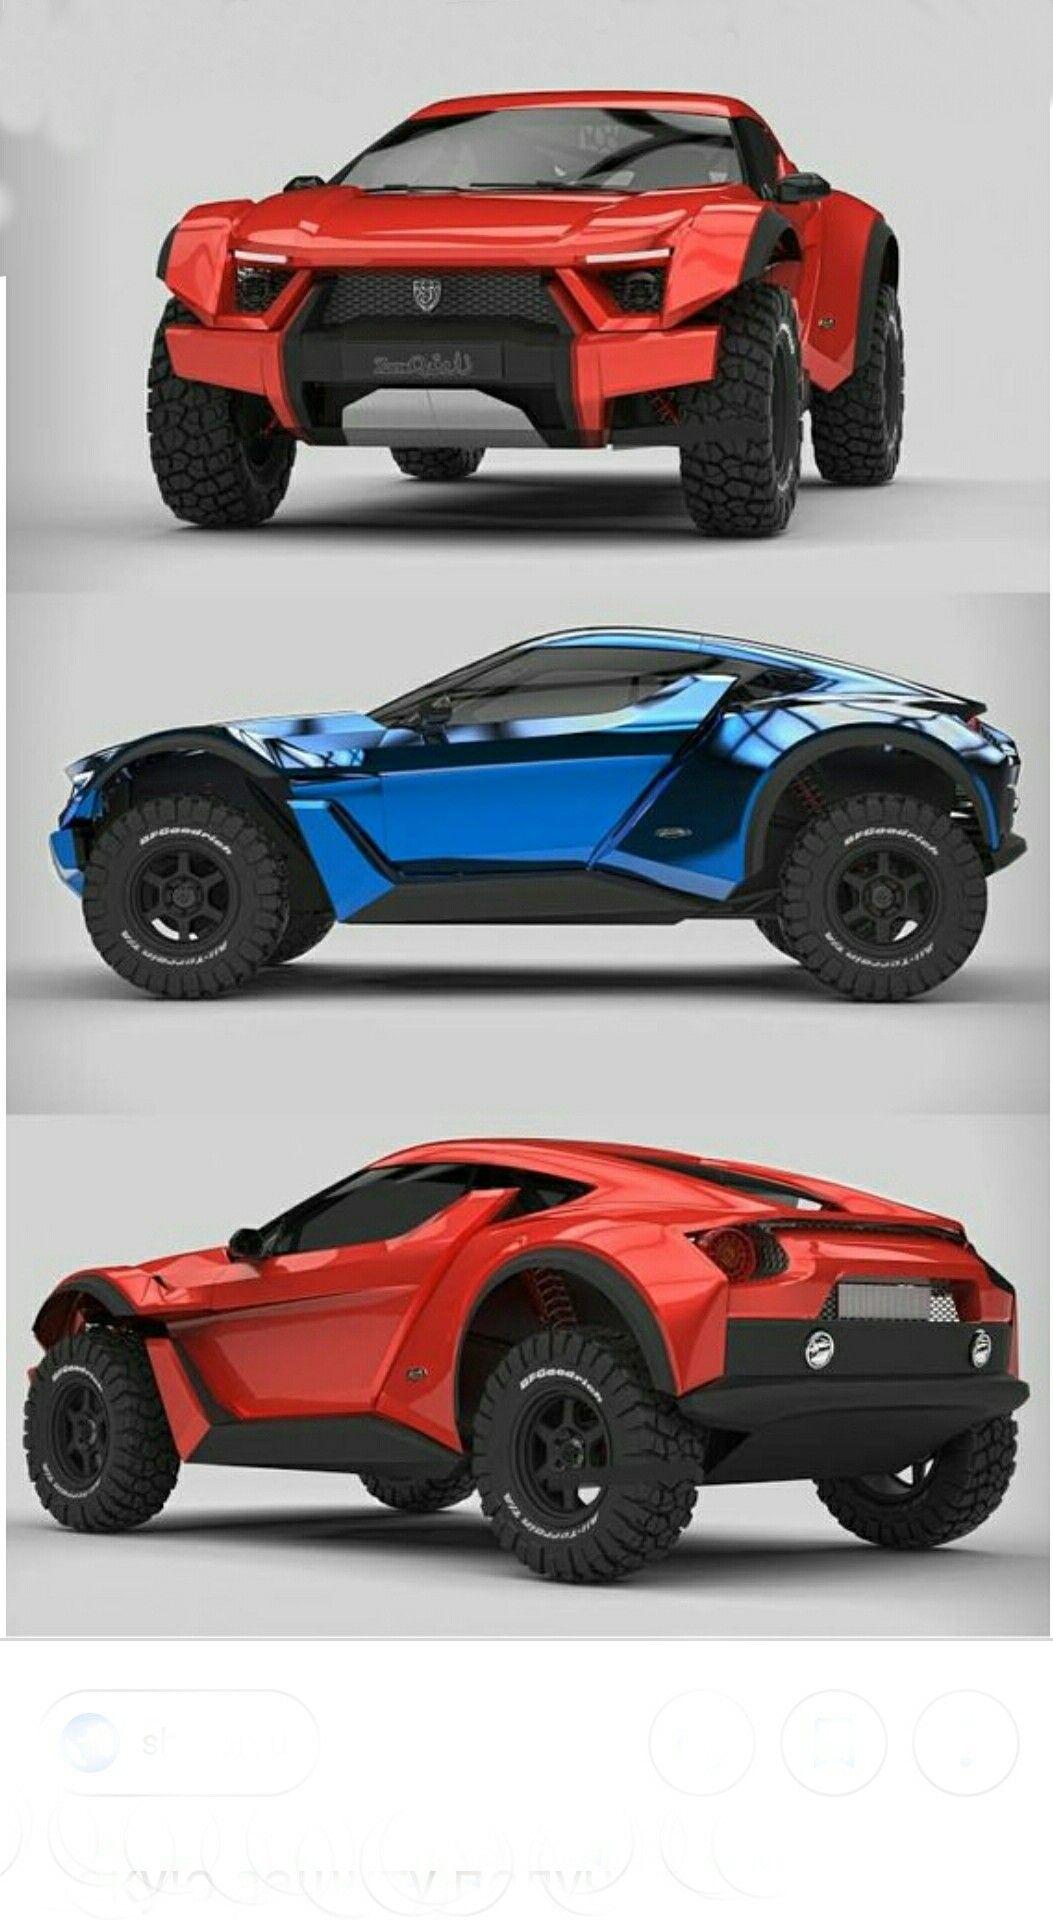 Zarooq Sand Racer 500hp V6 Engine 1179kg 315mm Ground Clearance Futuristic Cars Super Cars Concept Car Design